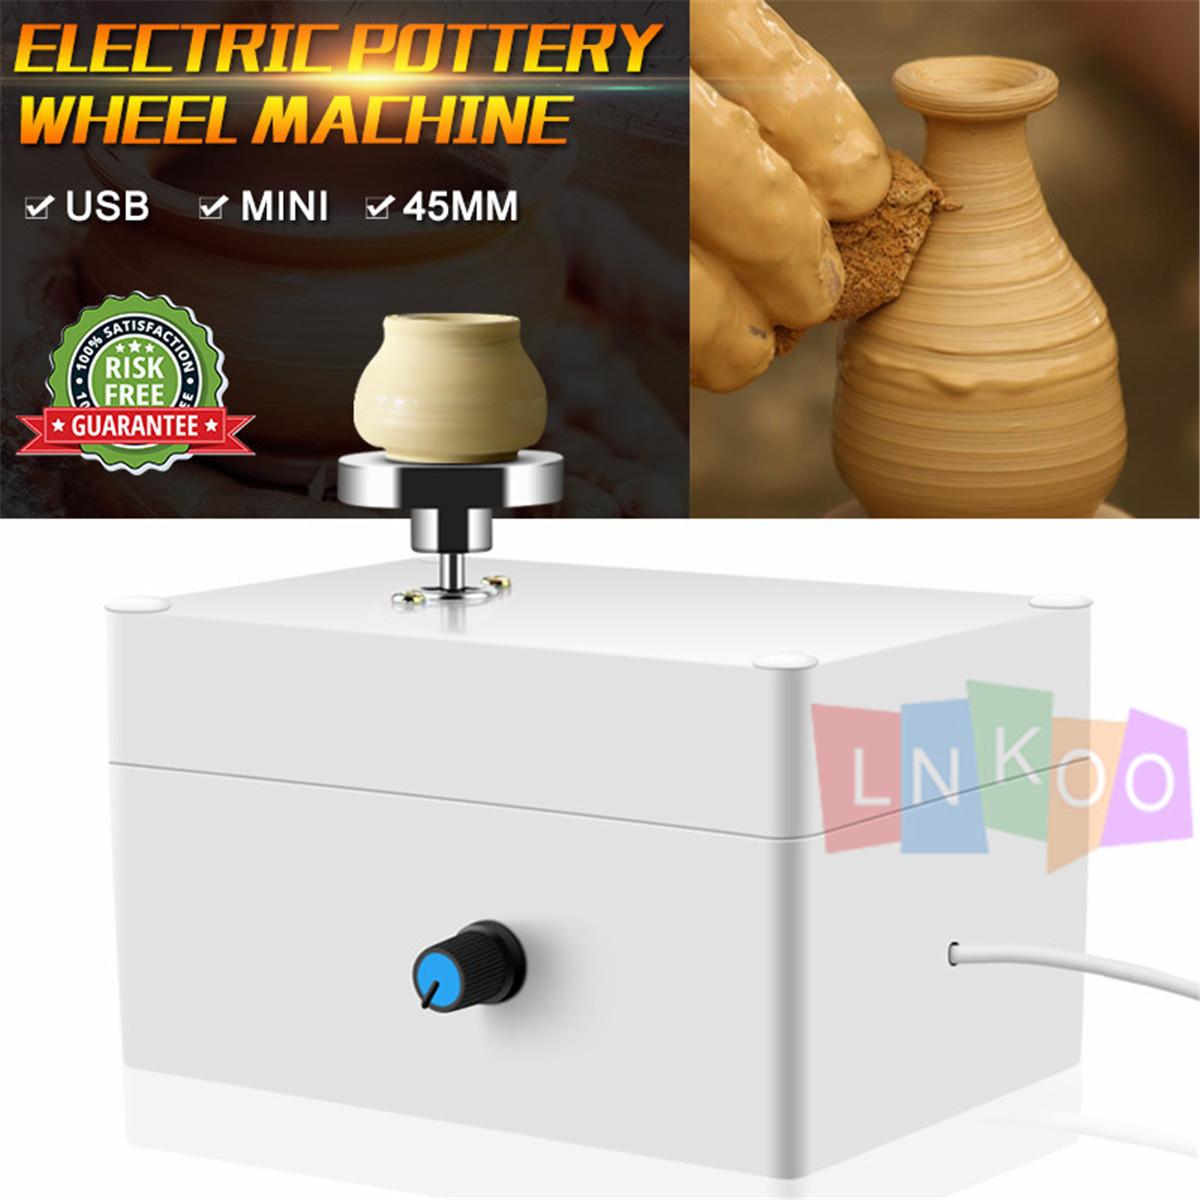 Mini Electric Pottery Wheel Ceramic Work Clay Art Craft Production Machine Ebay